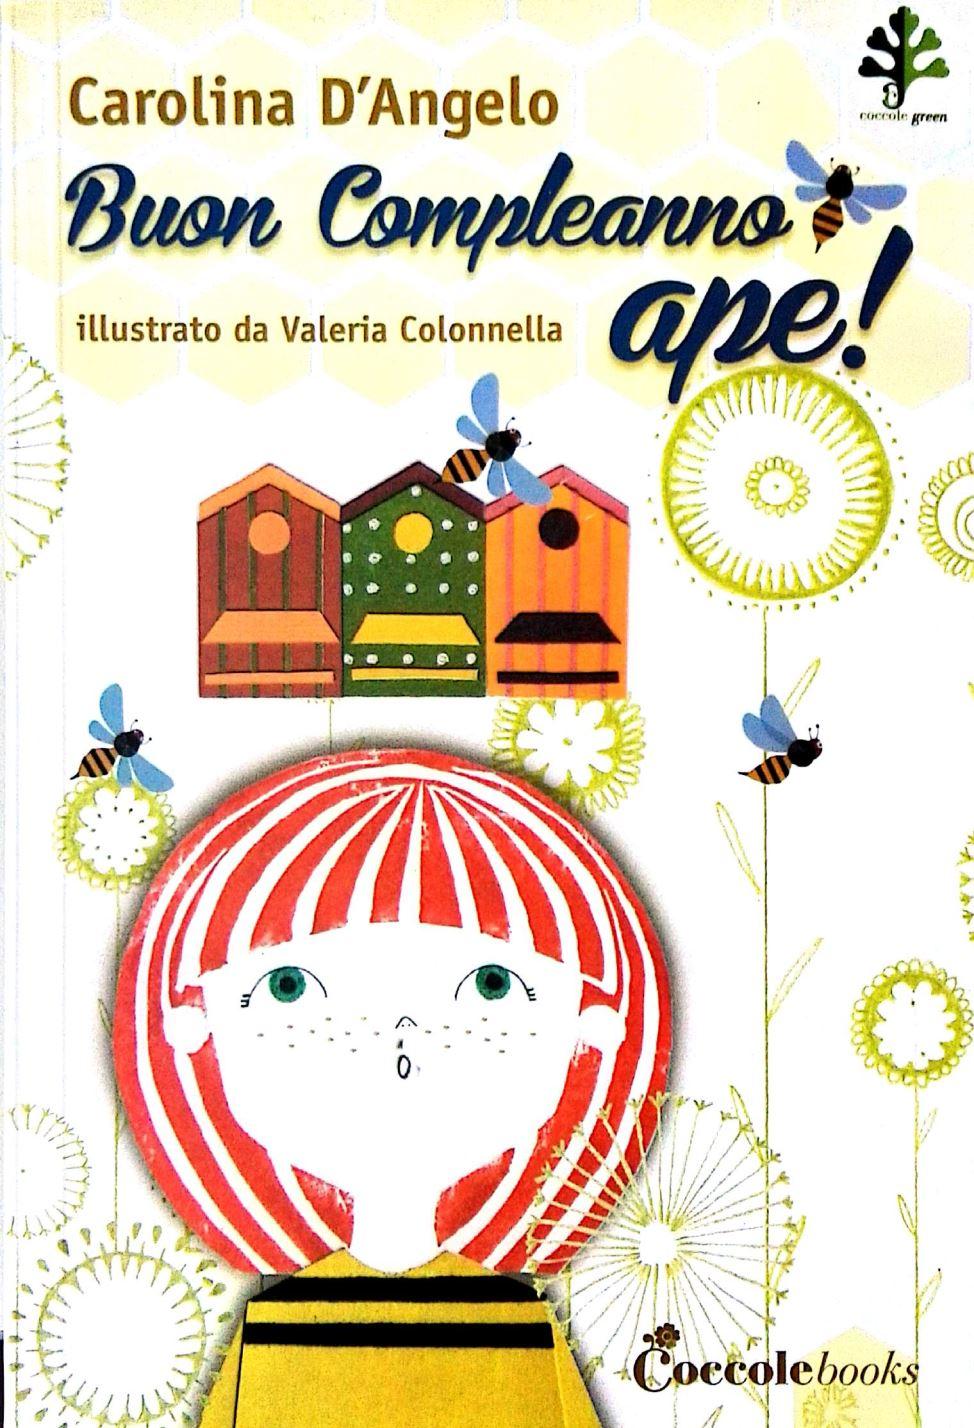 Buon Compleanno Ape Carolina D Angelo Coccole Books